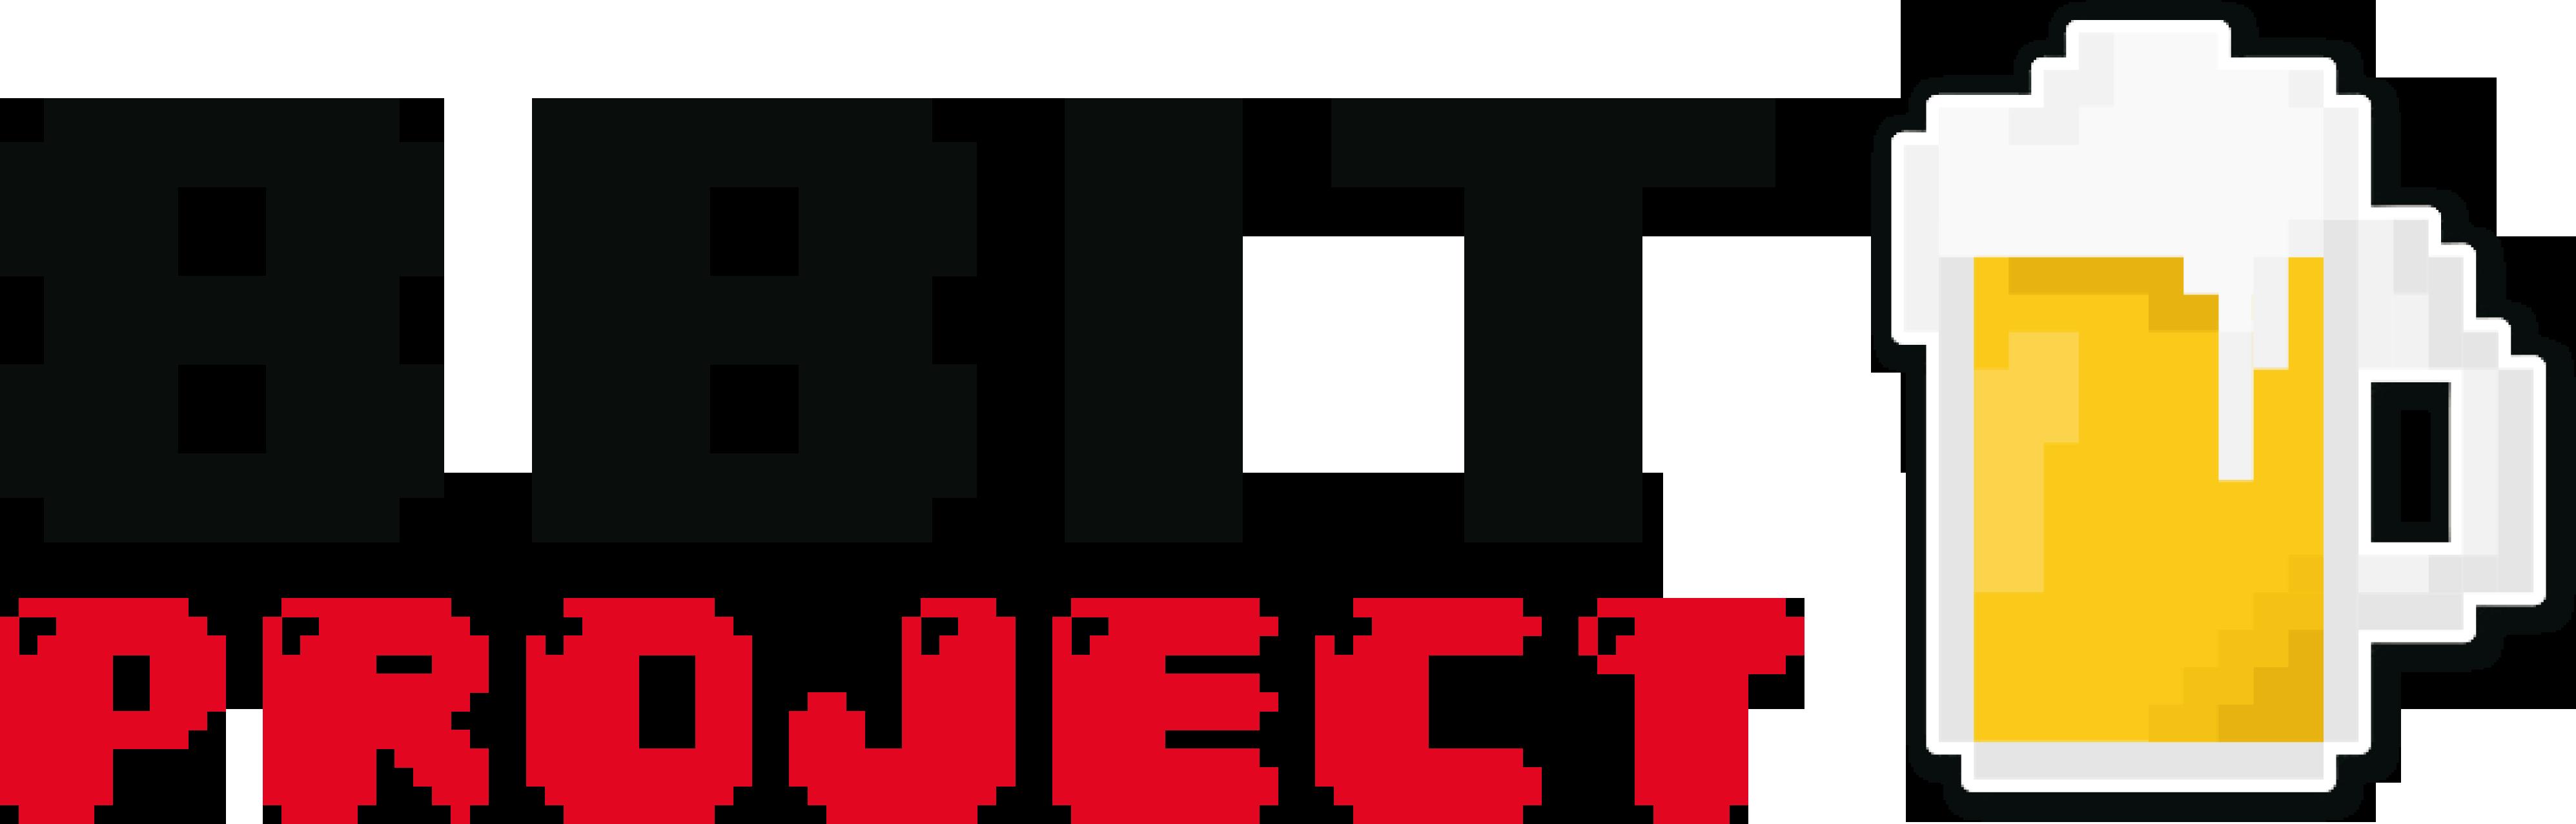 8bitproject